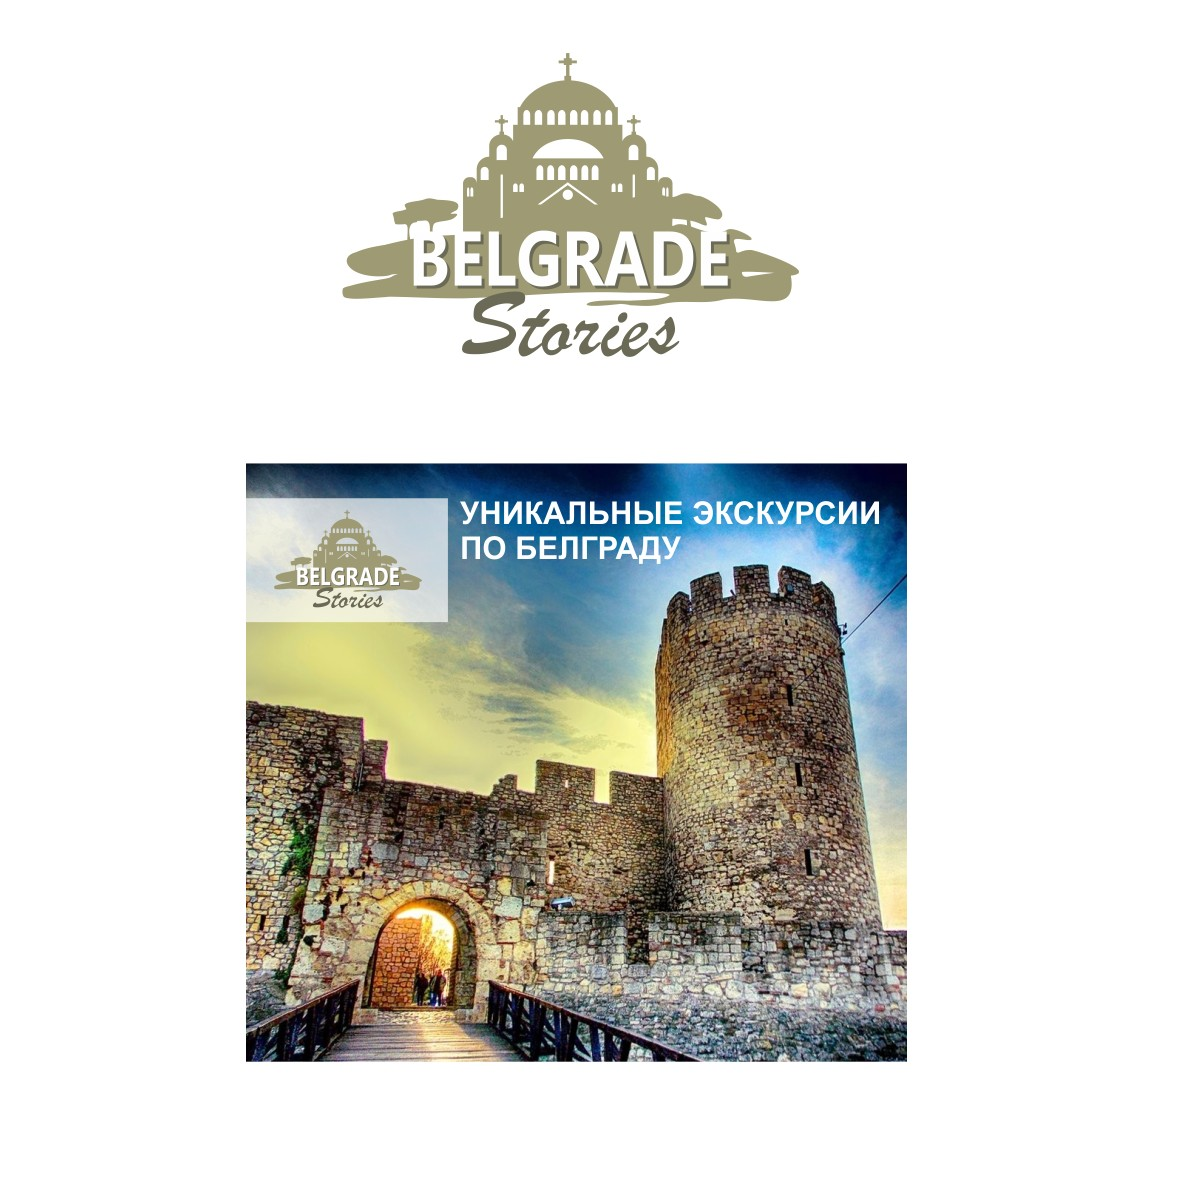 Логотип для агентства городских туров в Белграде фото f_3335890f035bd498.jpg